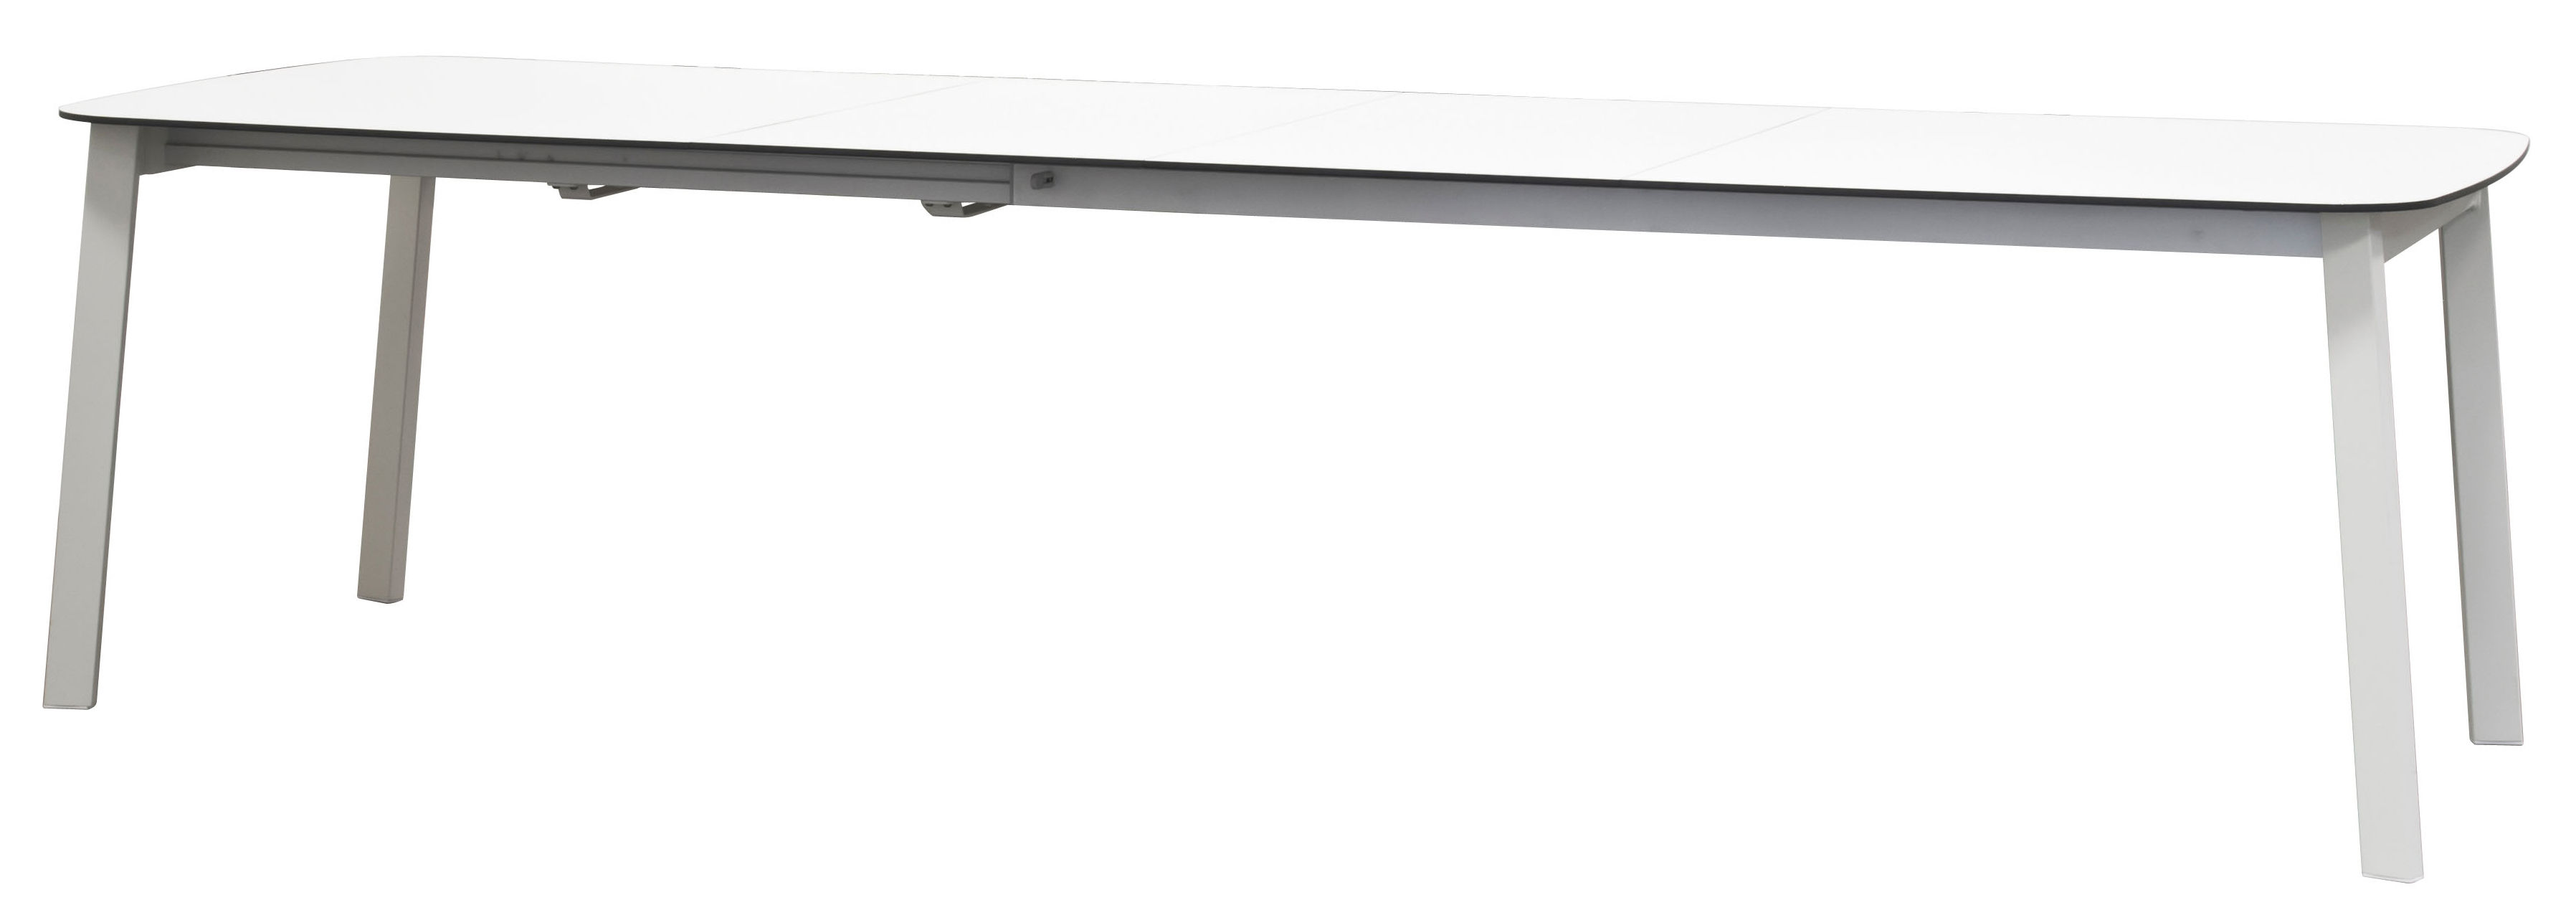 Jardin - Tables de jardin - Table à rallonge Shine / Plateau HPL - L 180 à 292 cm - Emu - Blanc / Plateau blanc - Aluminium verni, HPL